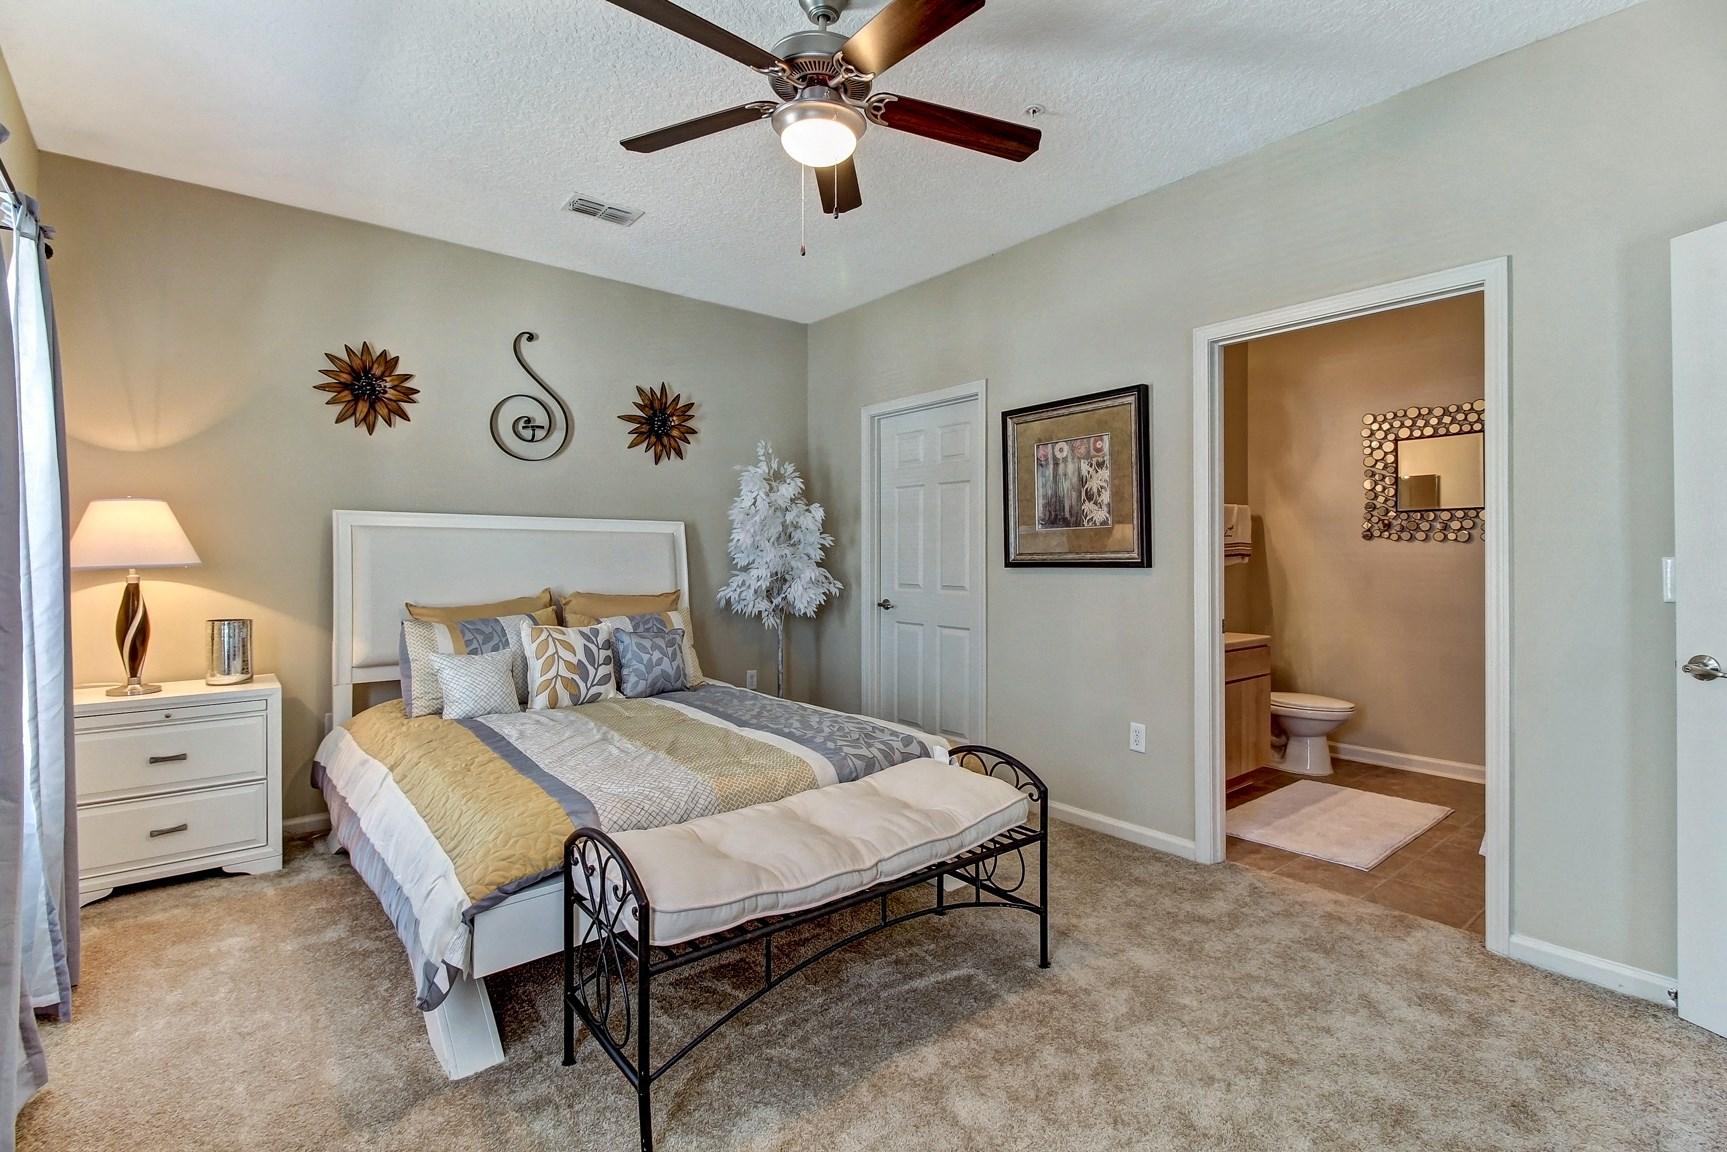 Bedroom at Magnolia Village Apartments in Jacksonville, FL